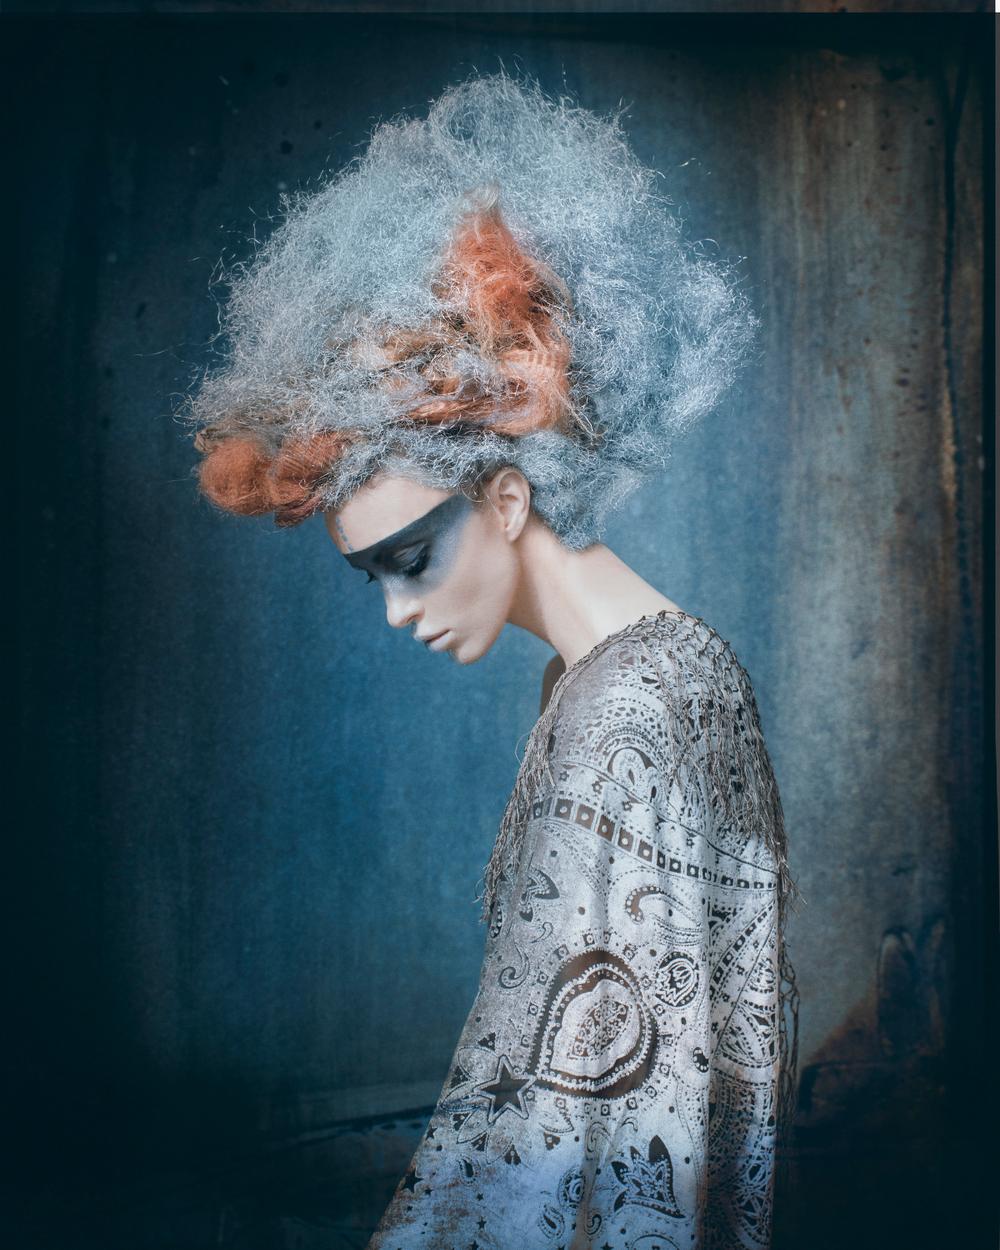 <strong>Piero Pirri</strong>, Pirri Hair Studio in Greenwich, CT